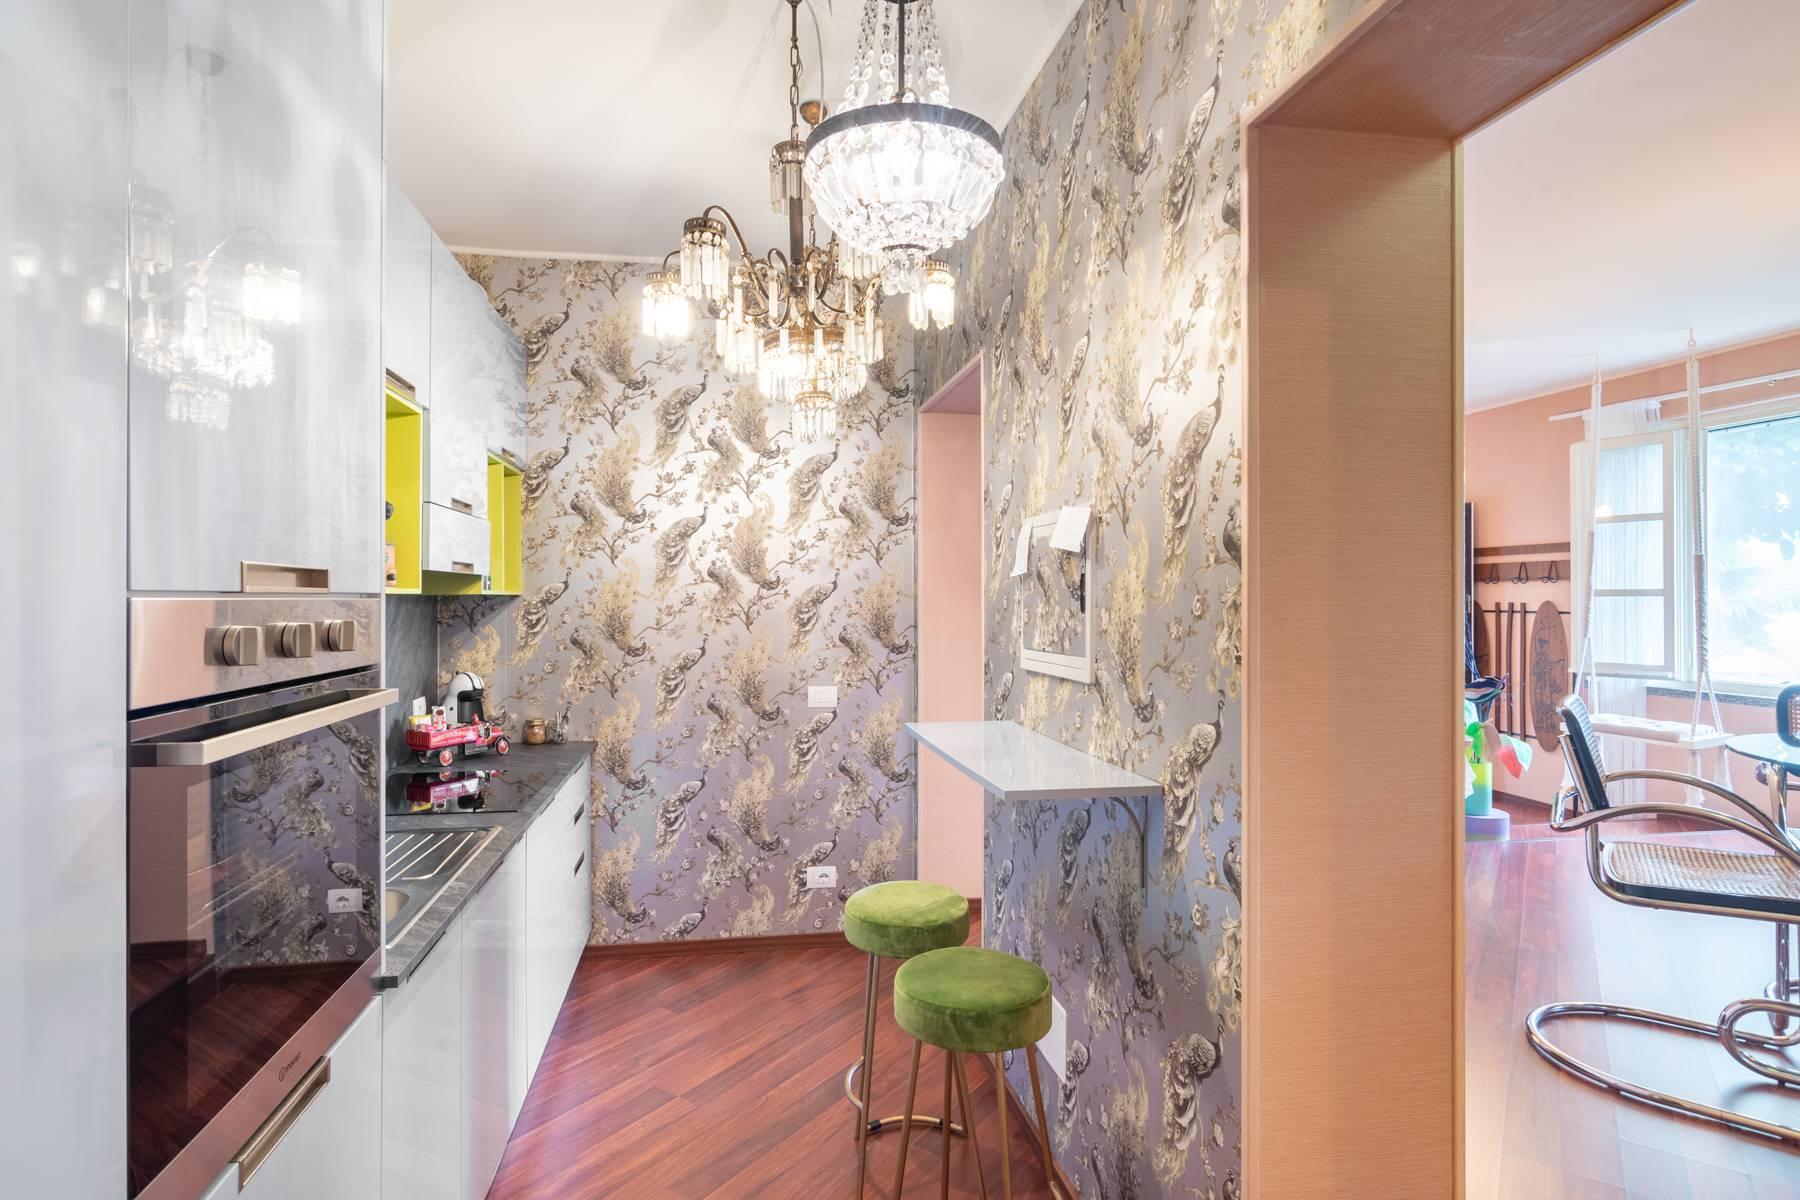 Elegant apartment in the small hamlet of Belgirate - 9